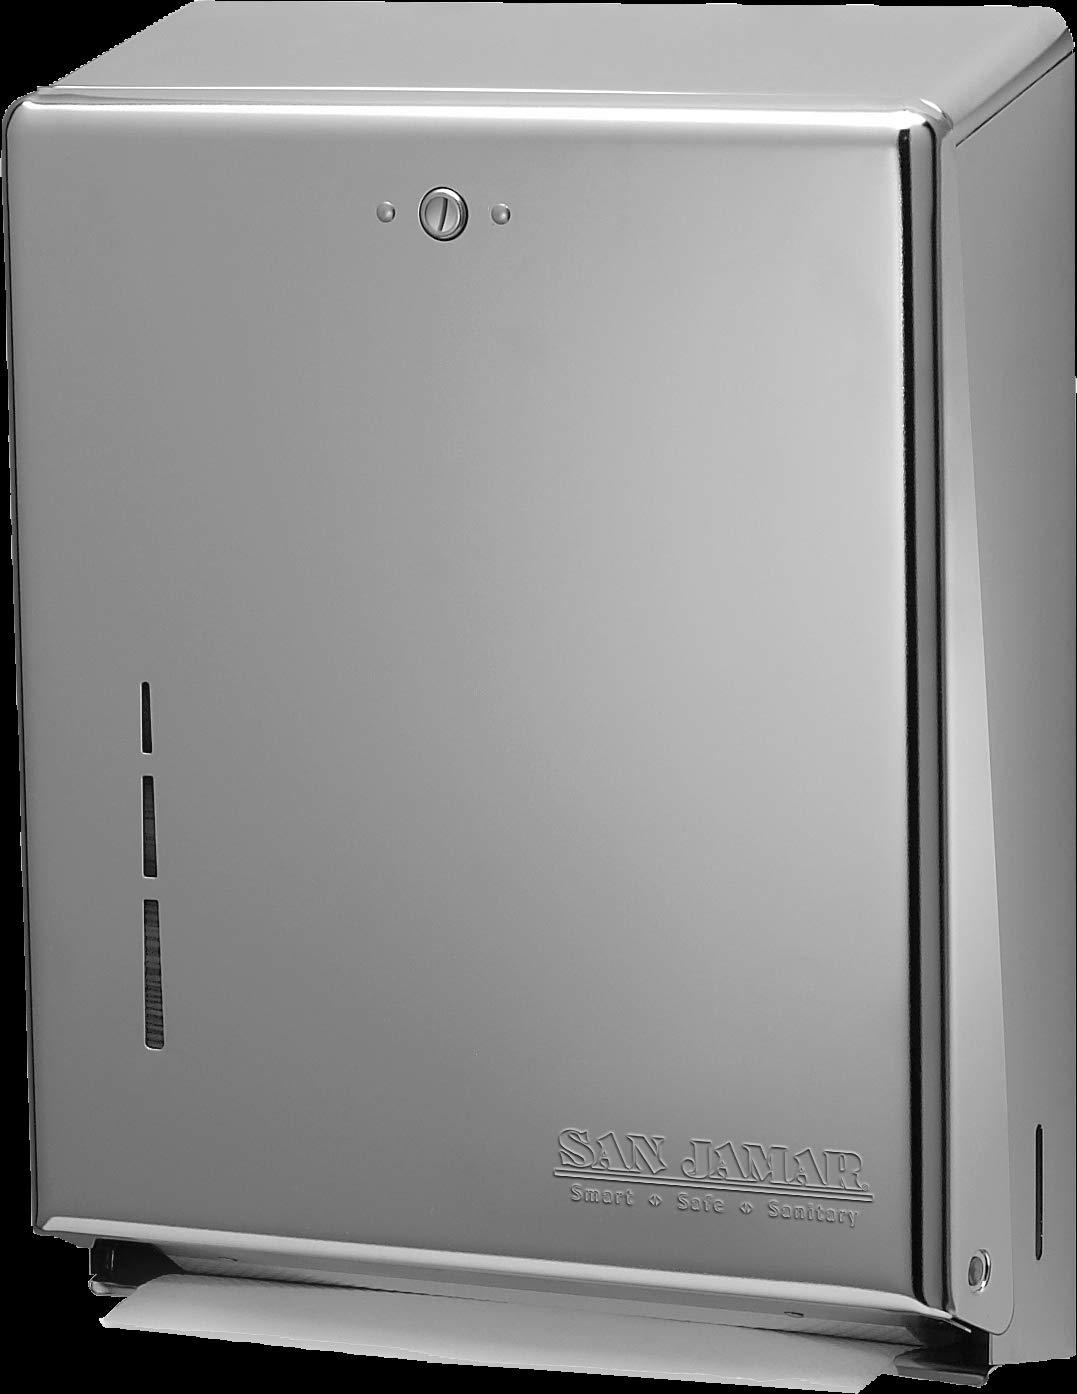 150 C-Fold Towel Capacity Chrome San Jamar T1950XC Mini C-Fold//Multifold/Commercial Towel Dispenser 250 Multifold